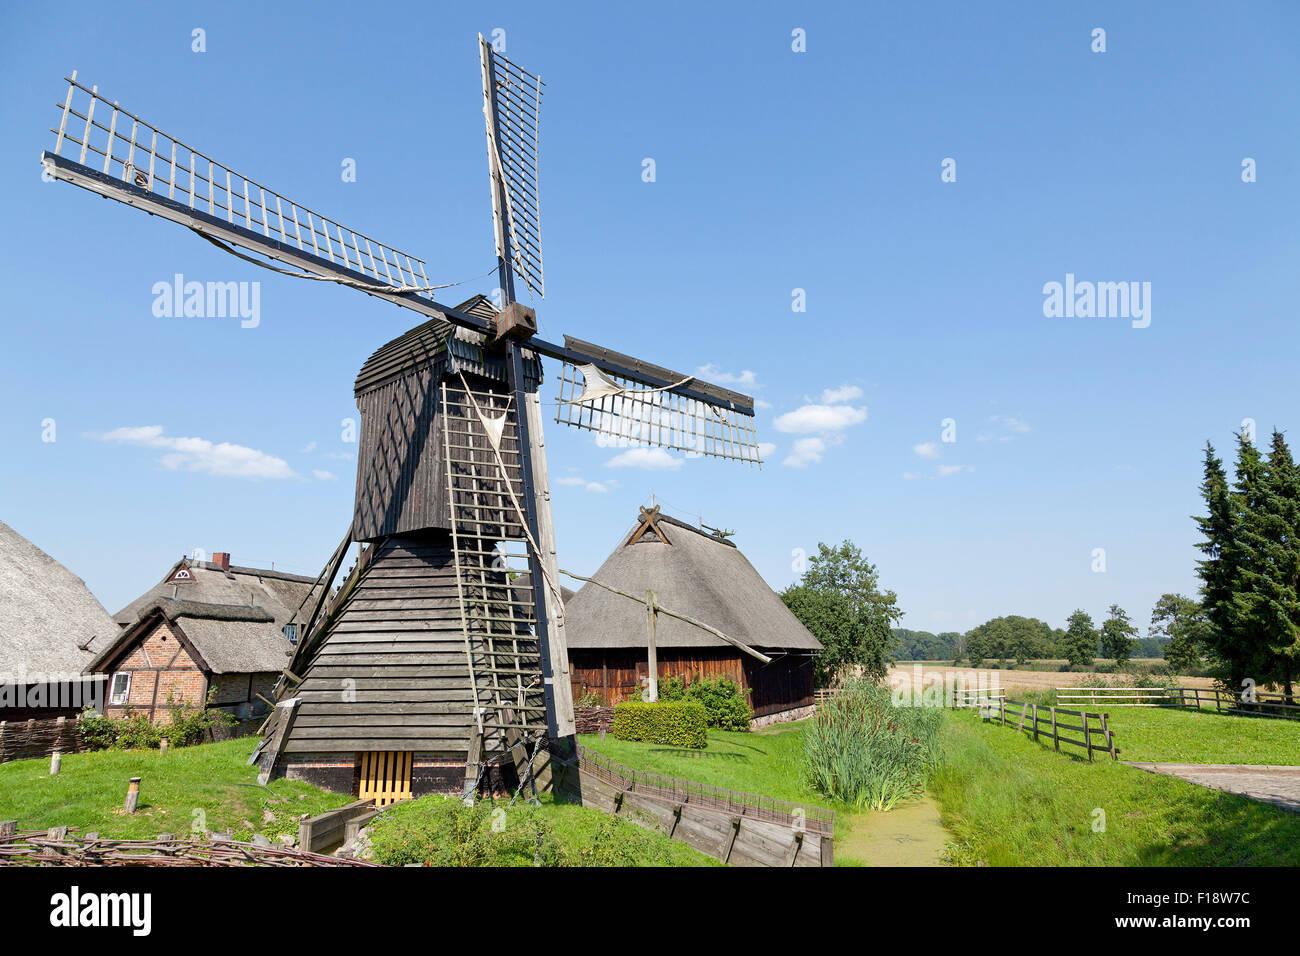 post mill, open air museum ´Rieck Haus´, Curslack, Vierlande, Hamburg, Germany Stock Photo